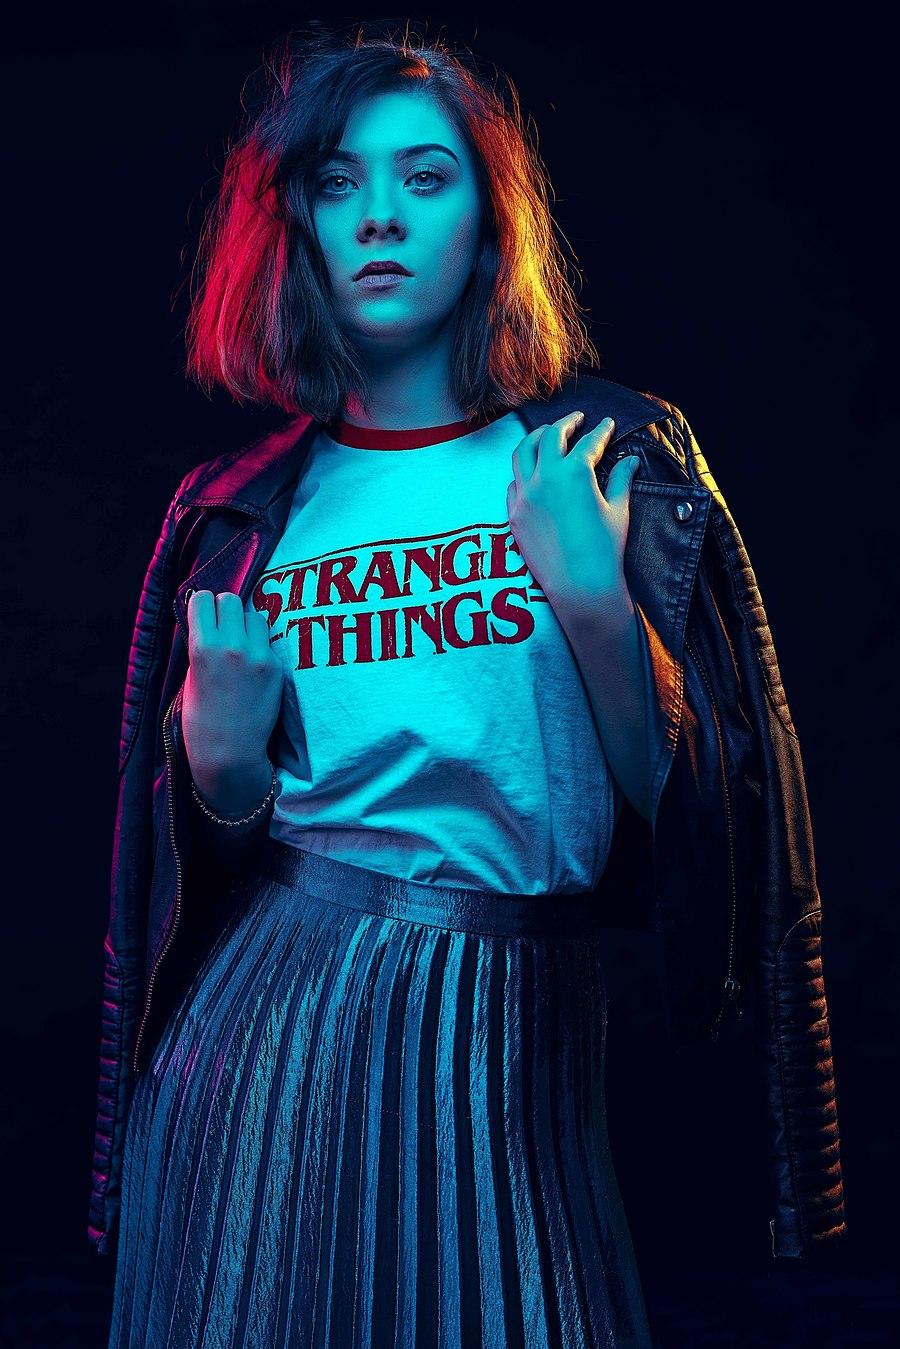 Be Cool / Photography by David Abbs, Model Brogan Alexandra, Taken at Studio 33 / Uploaded 6th October 2018 @ 06:23 PM